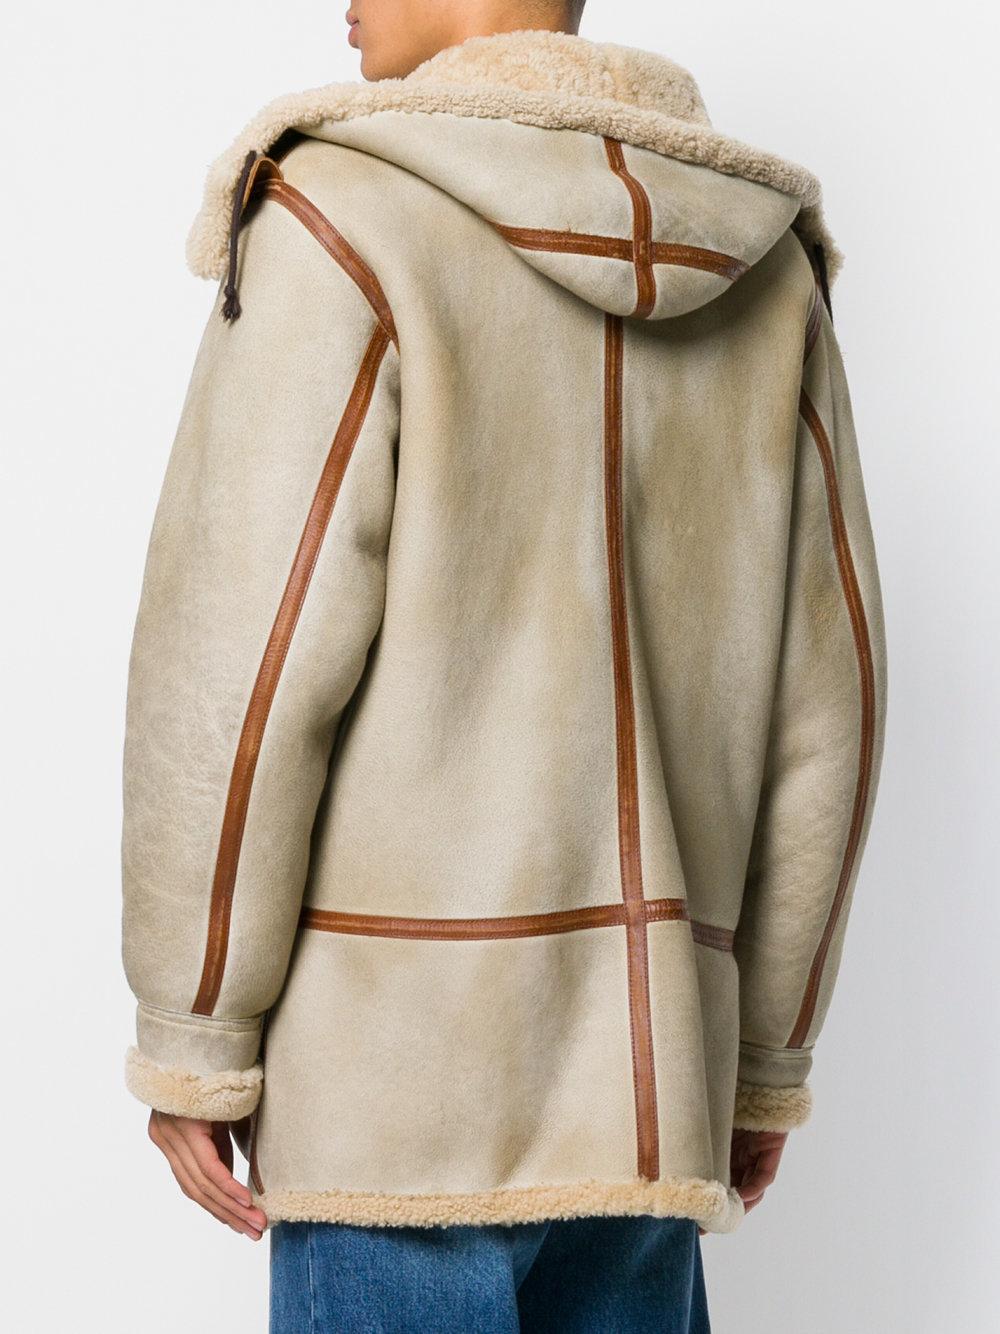 Vintage Shearling Duffle Coat